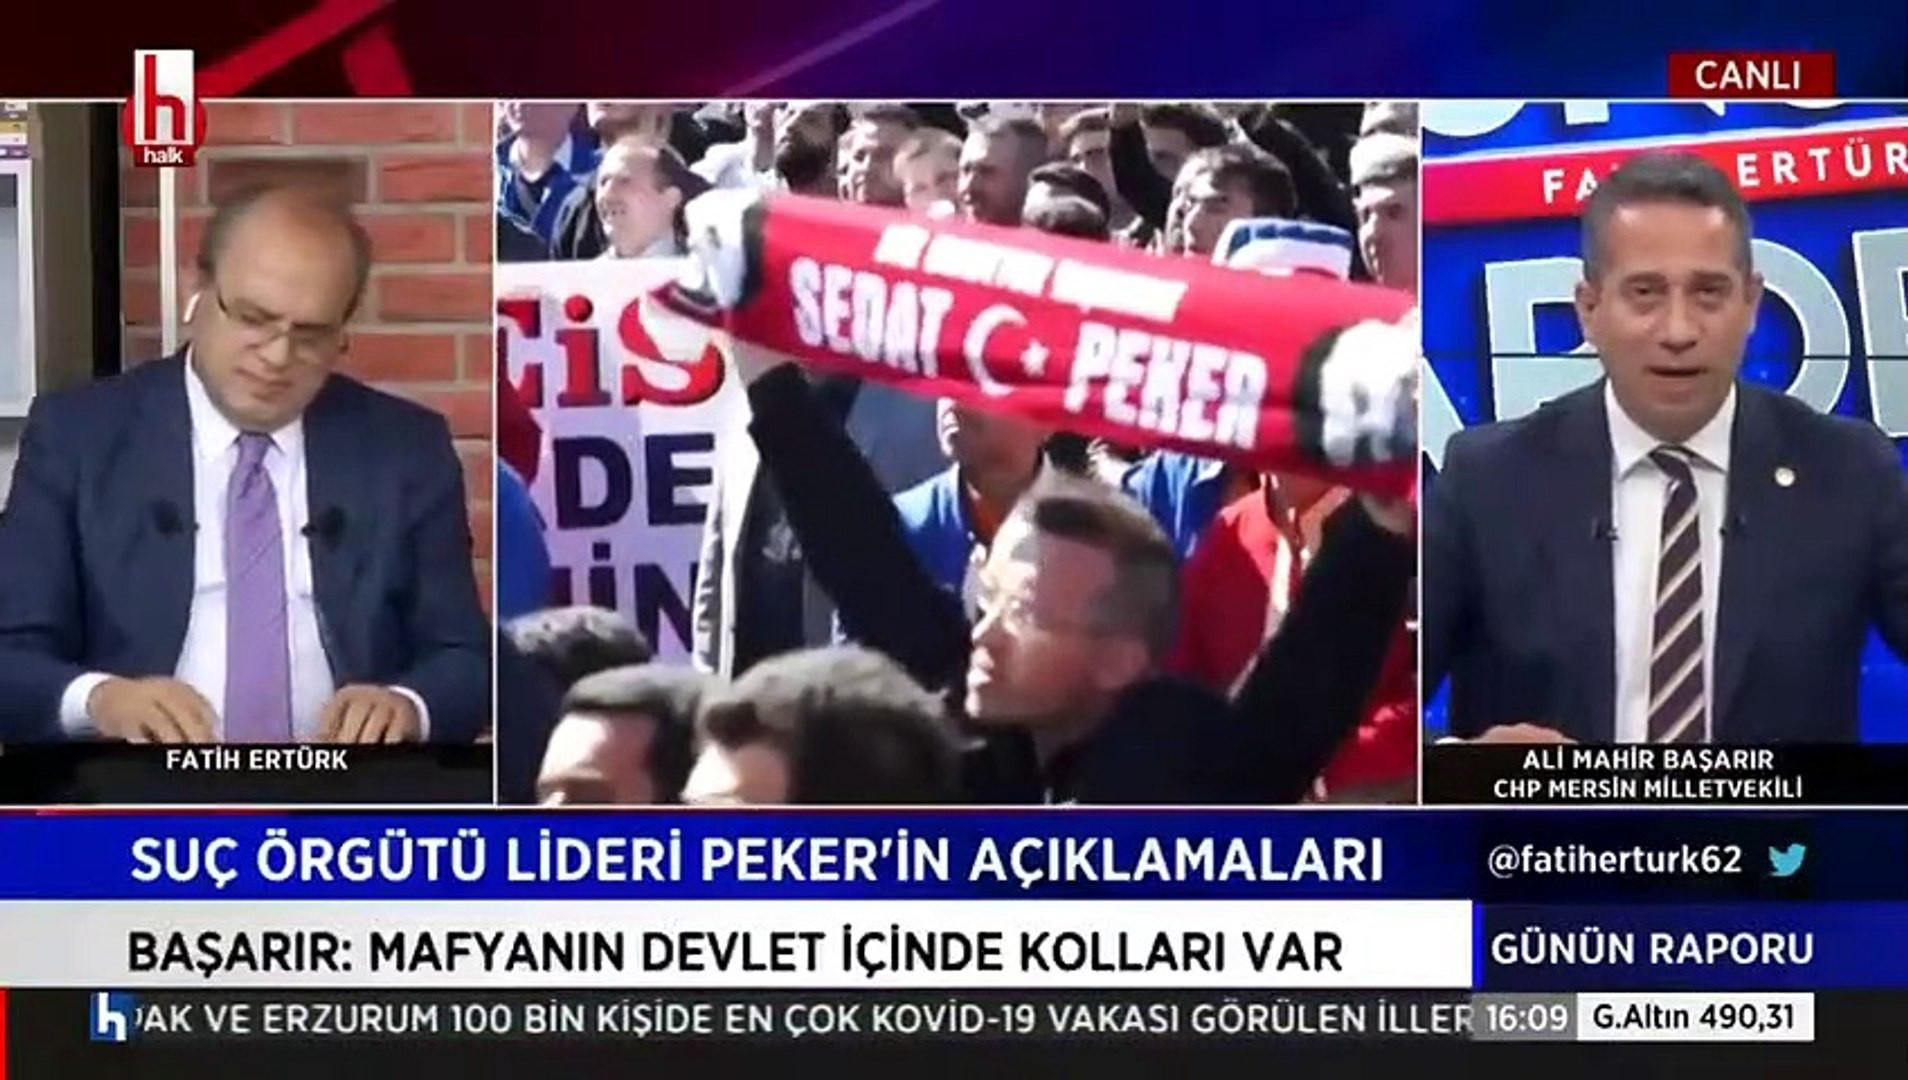 CHP'den Süleyman Soylu'ya: Derhal istifa et 'Temiz Süleyman'